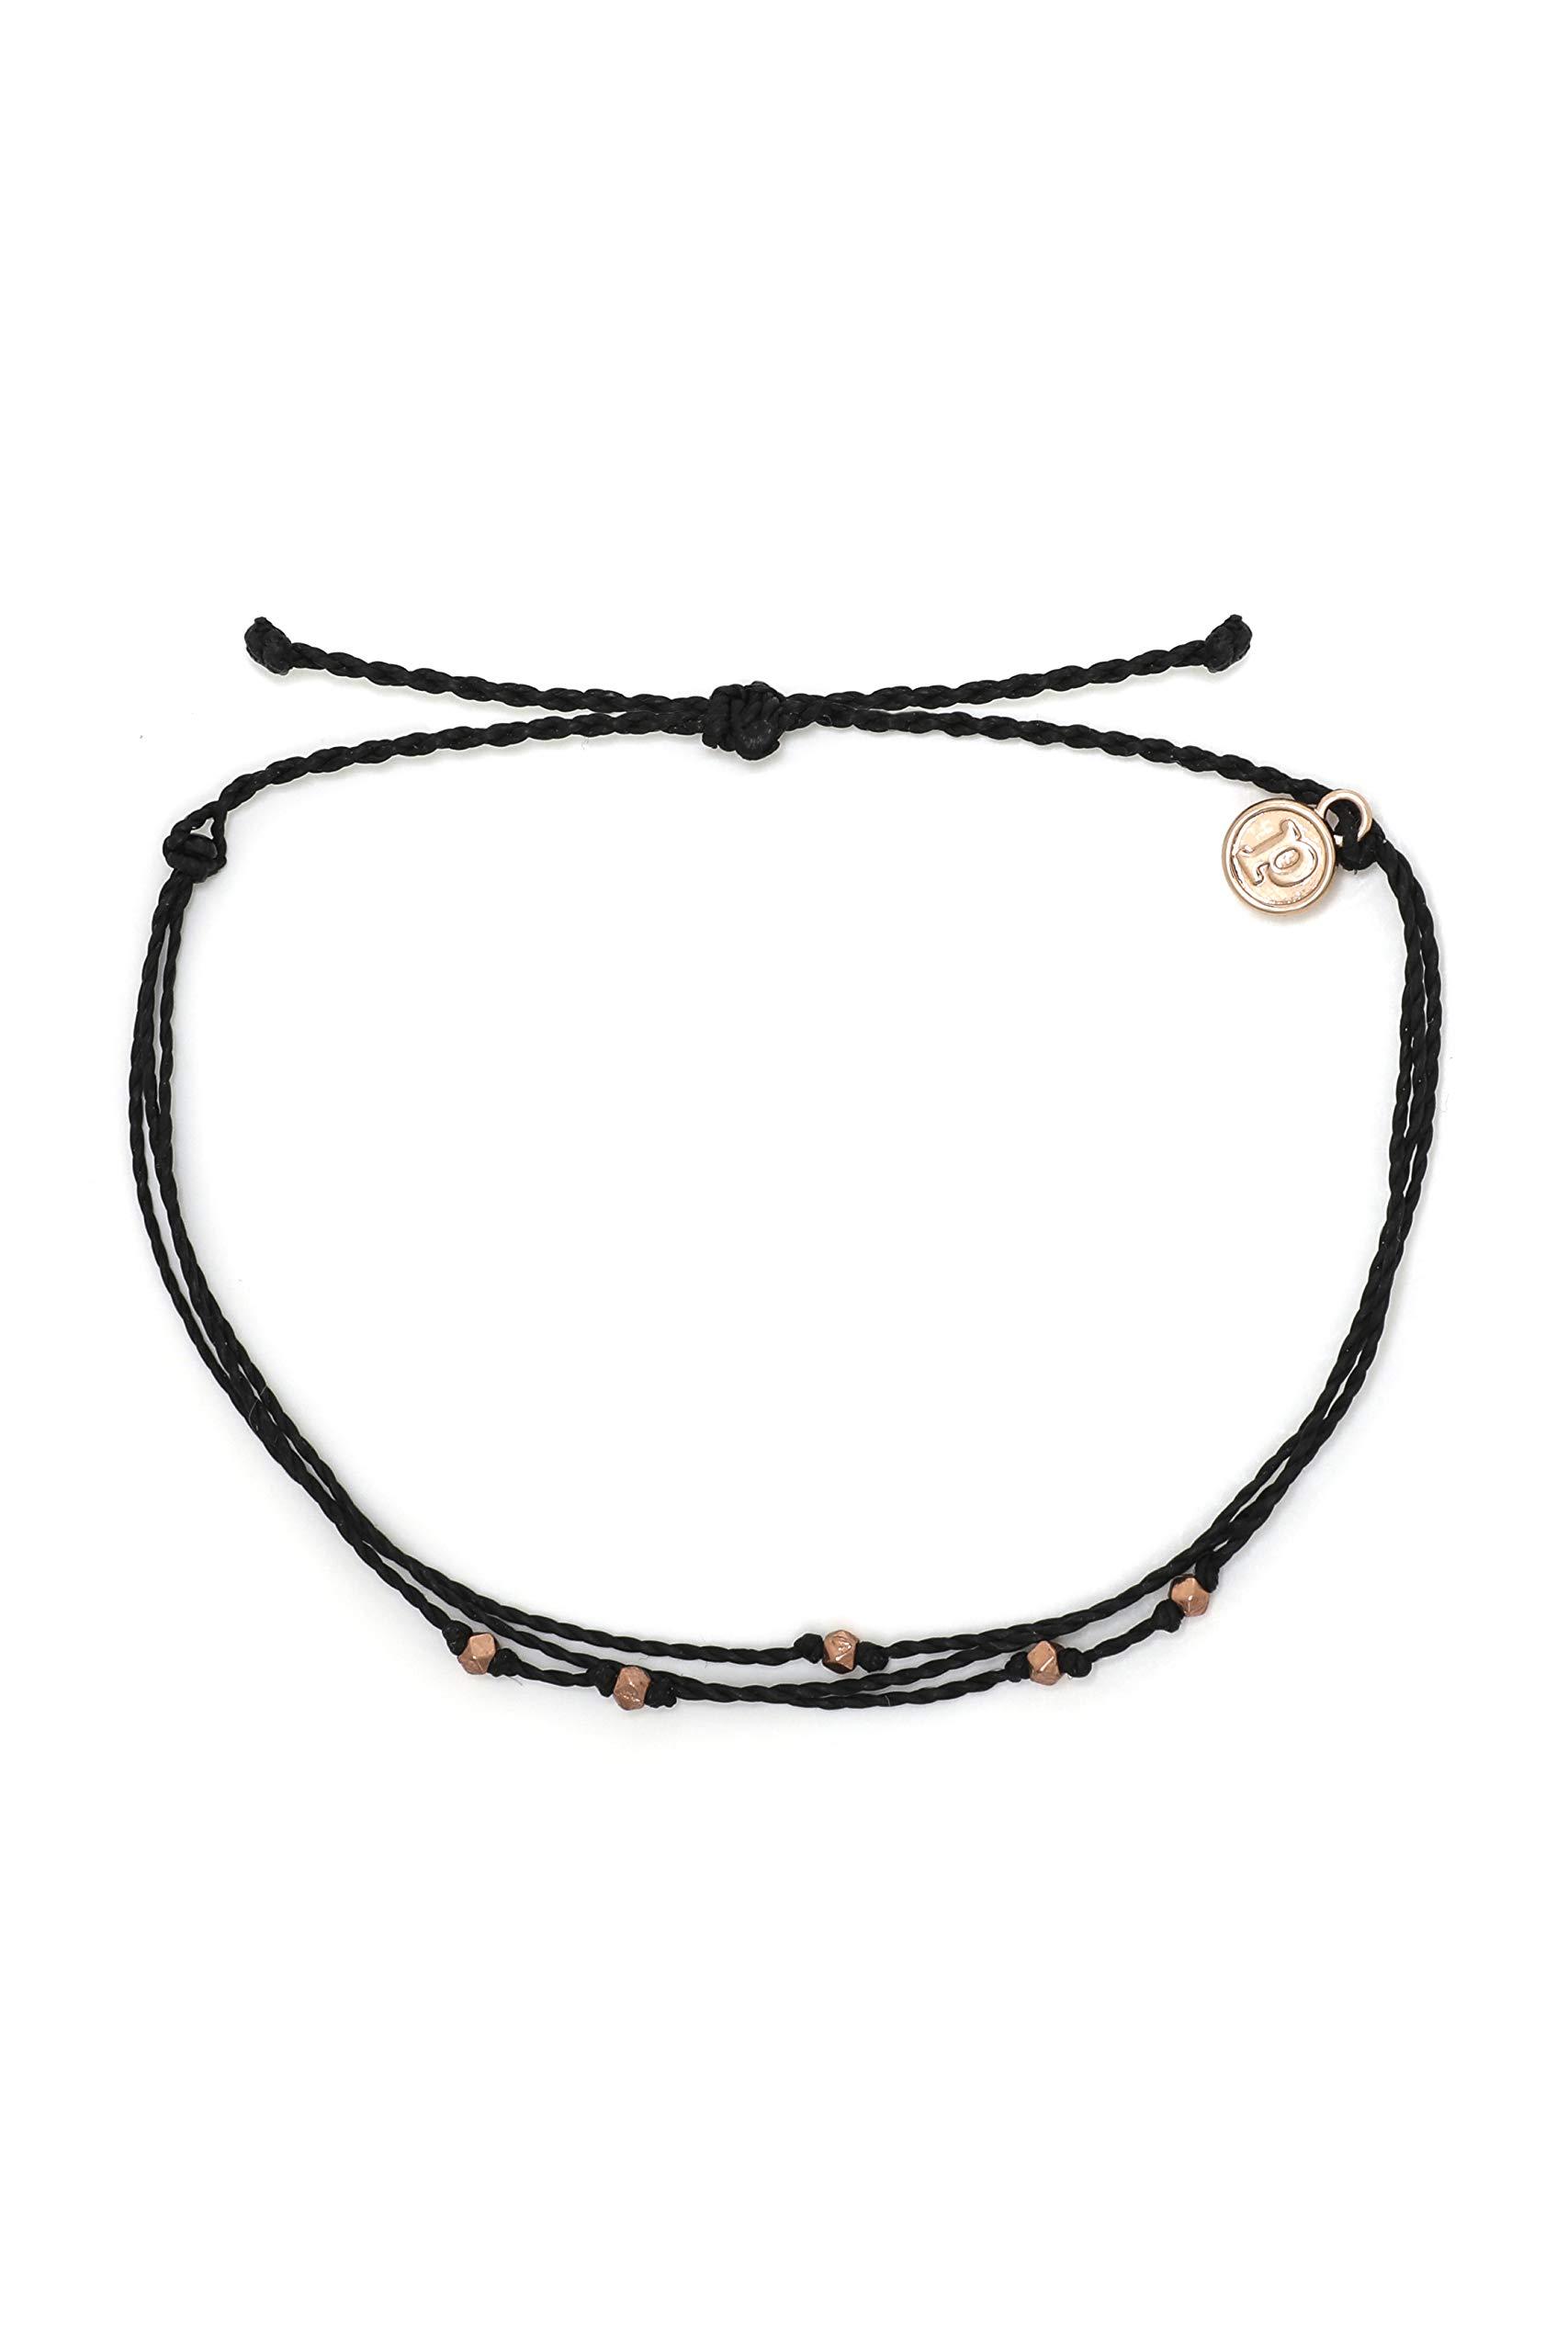 Pura Vida Rose Gold Malibu Anklet w/Plated Charm - Adjustable Band, 100% Waterproof - Black